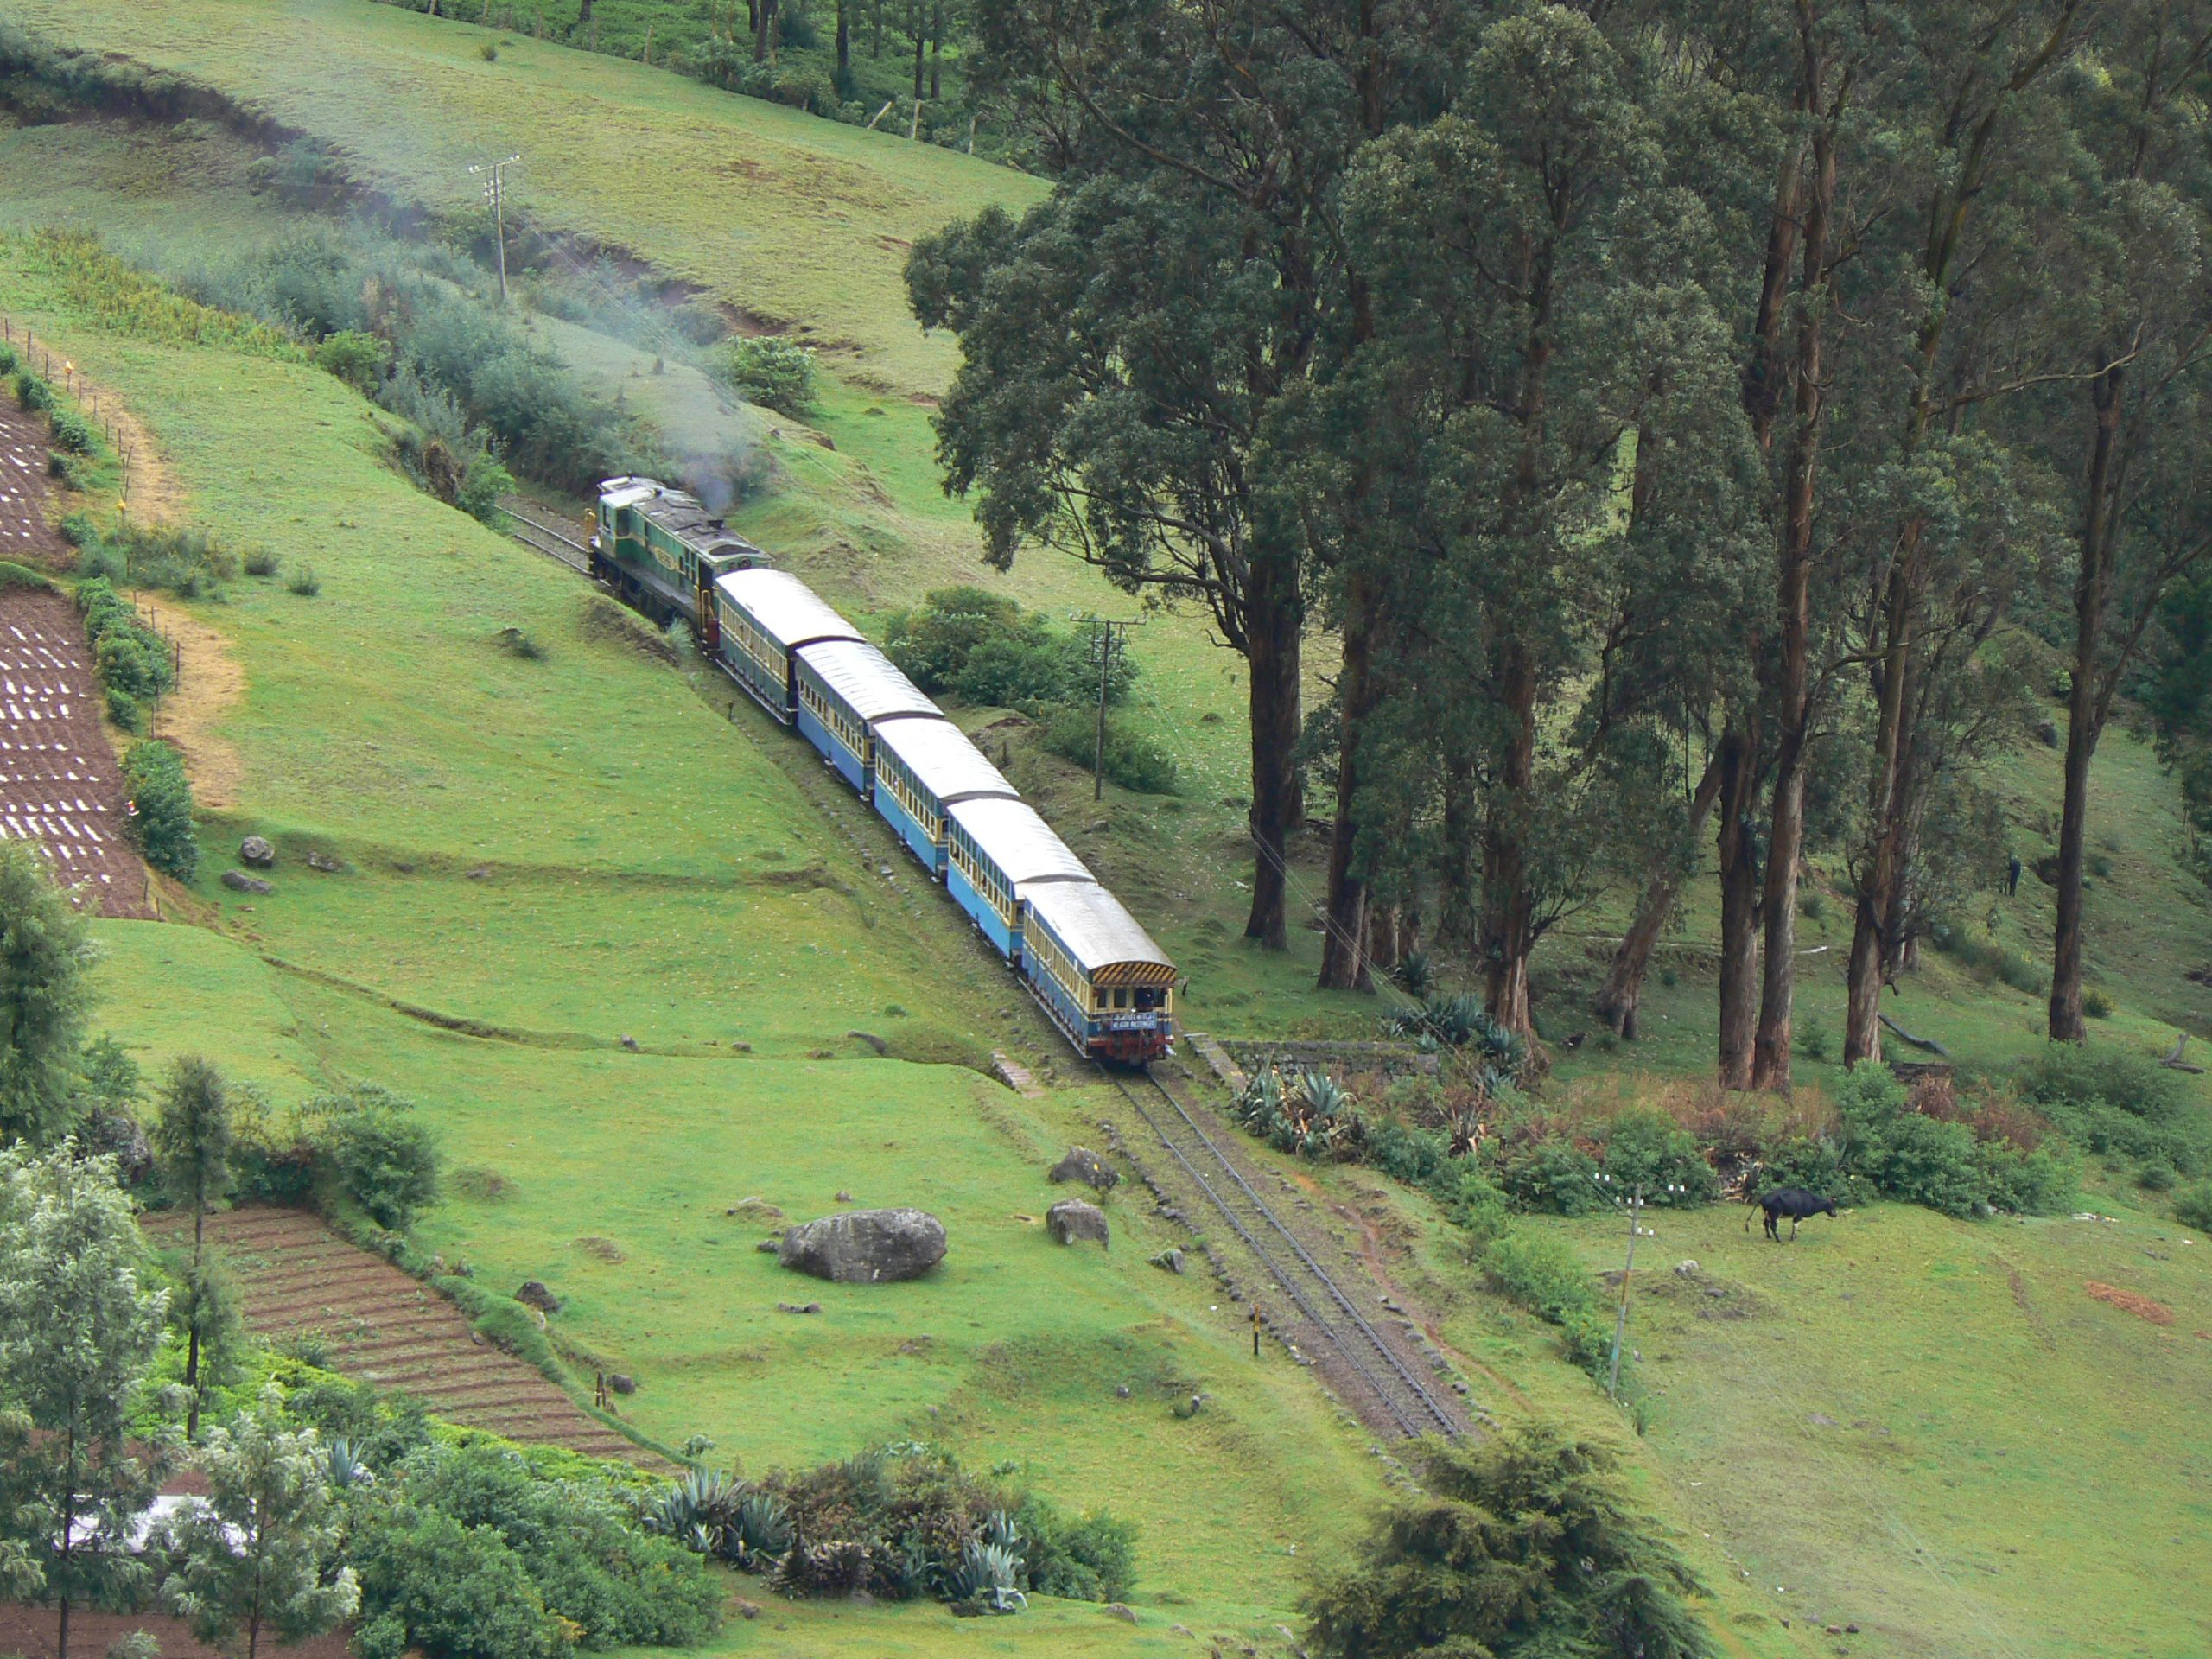 Top Ecotourism Destination In Tamil Nadu-Nilgiris